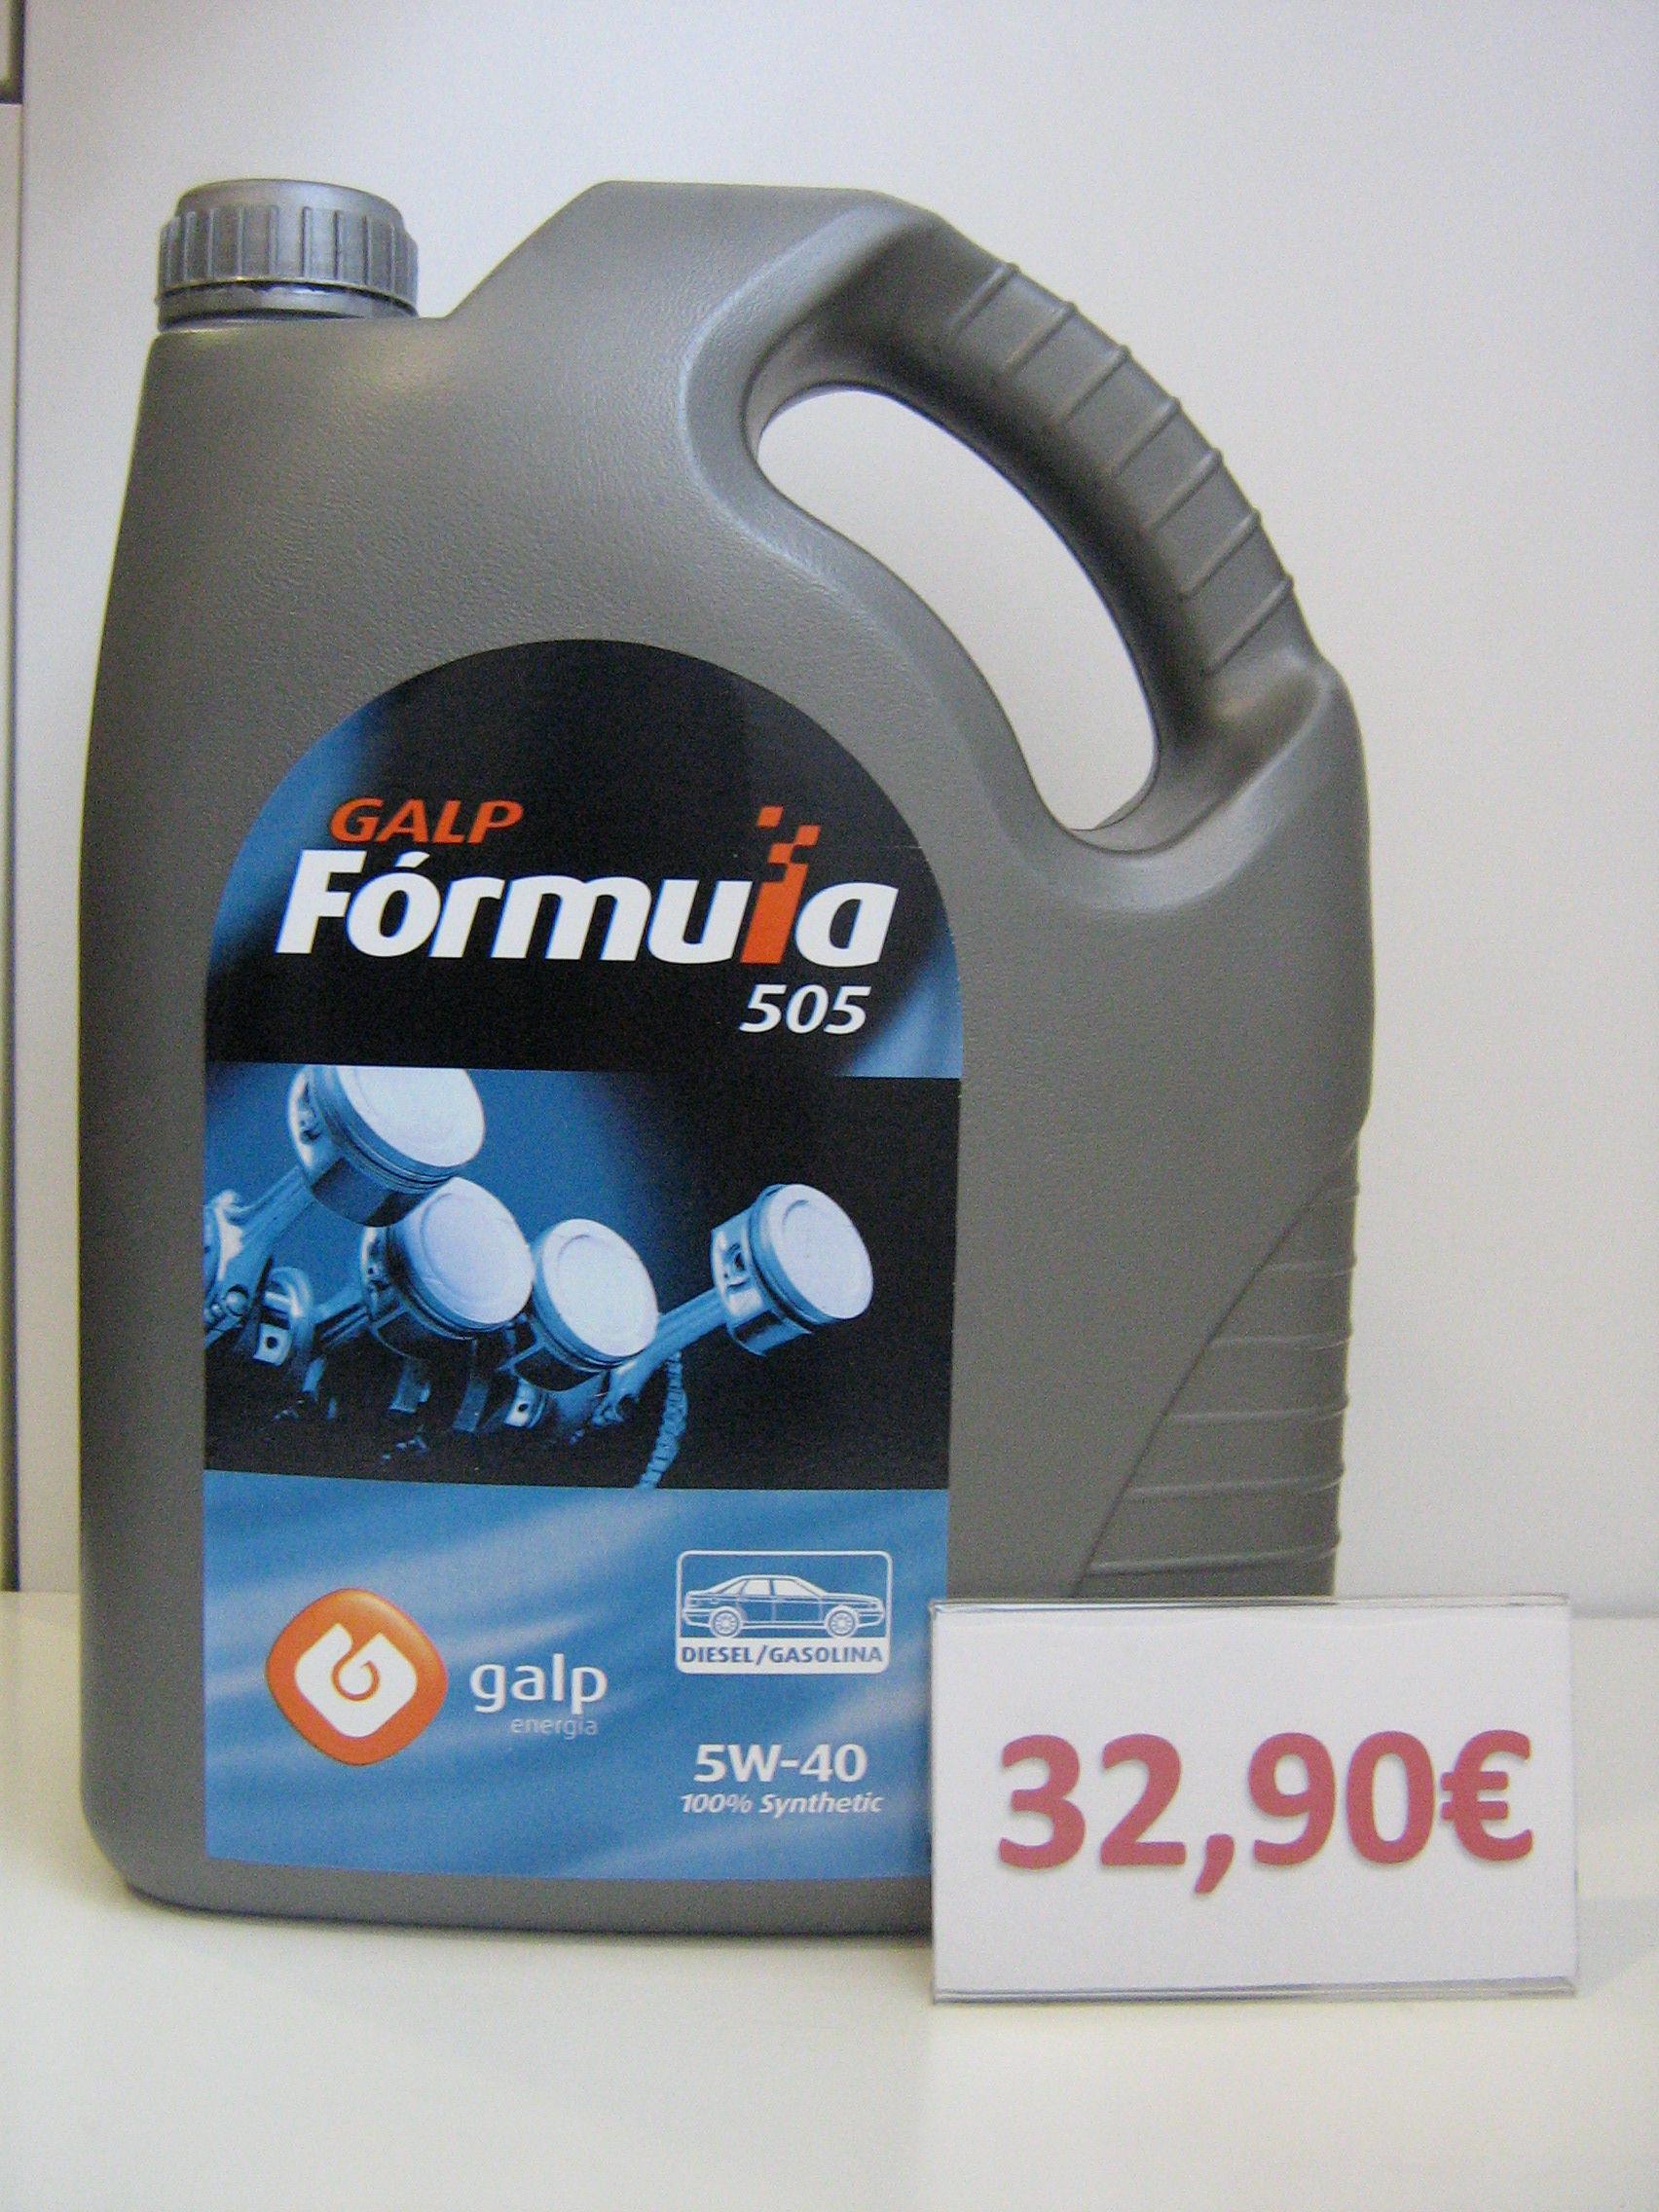 GALP FORMULA 505 DIESEL/GASOLINA 5W40 : Servicios de Safety Car